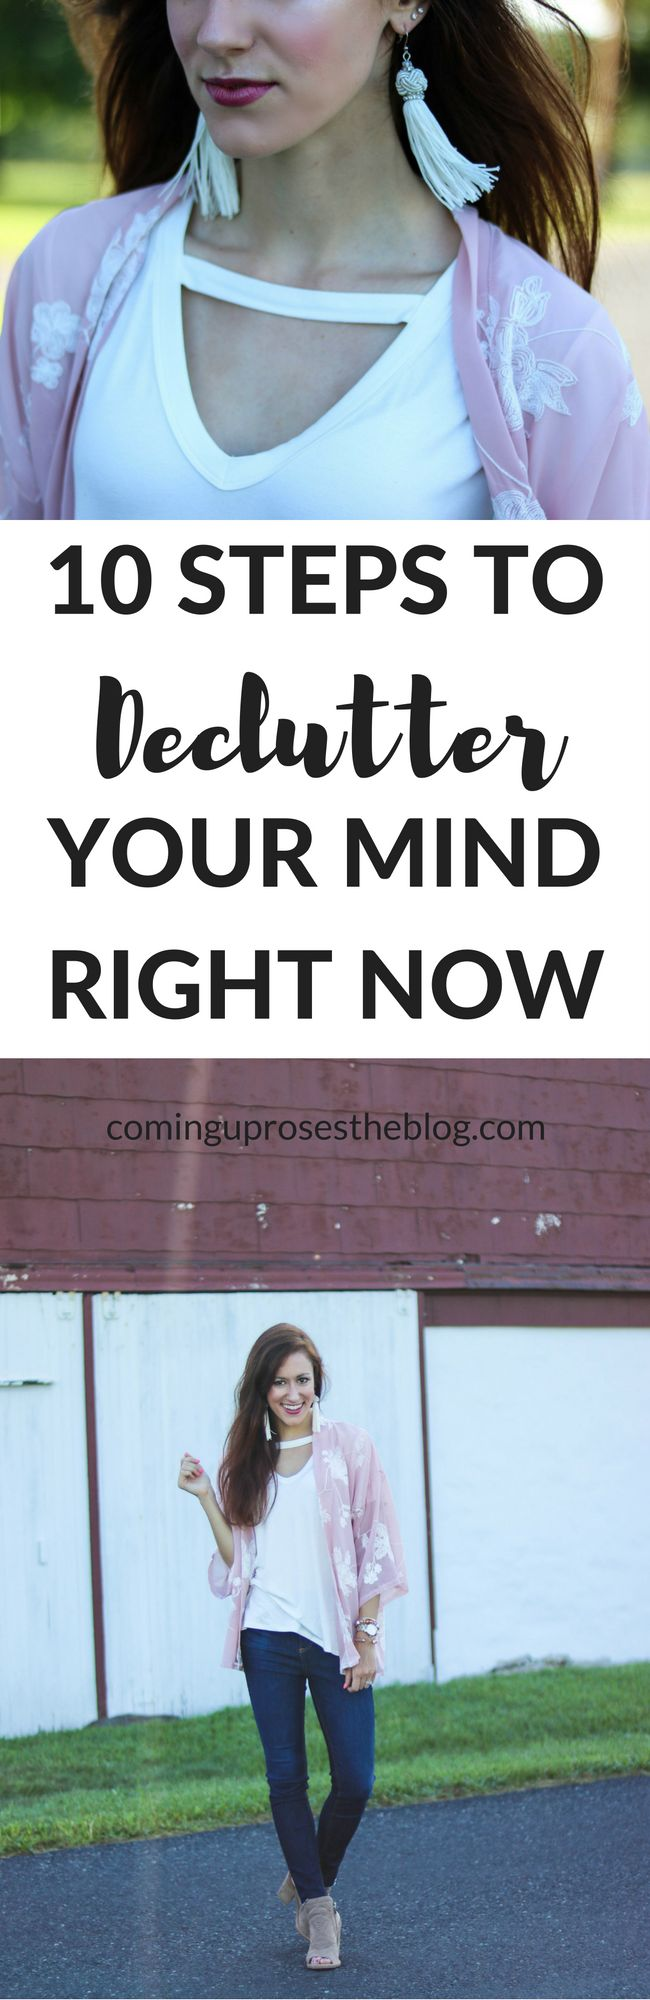 declutter your mind, brain dump, how to declutter your mind, decluttering tips, decluttering, decluttering ideas, declutter your mind thoughts, declutter your mind quotes, declutter your mind book